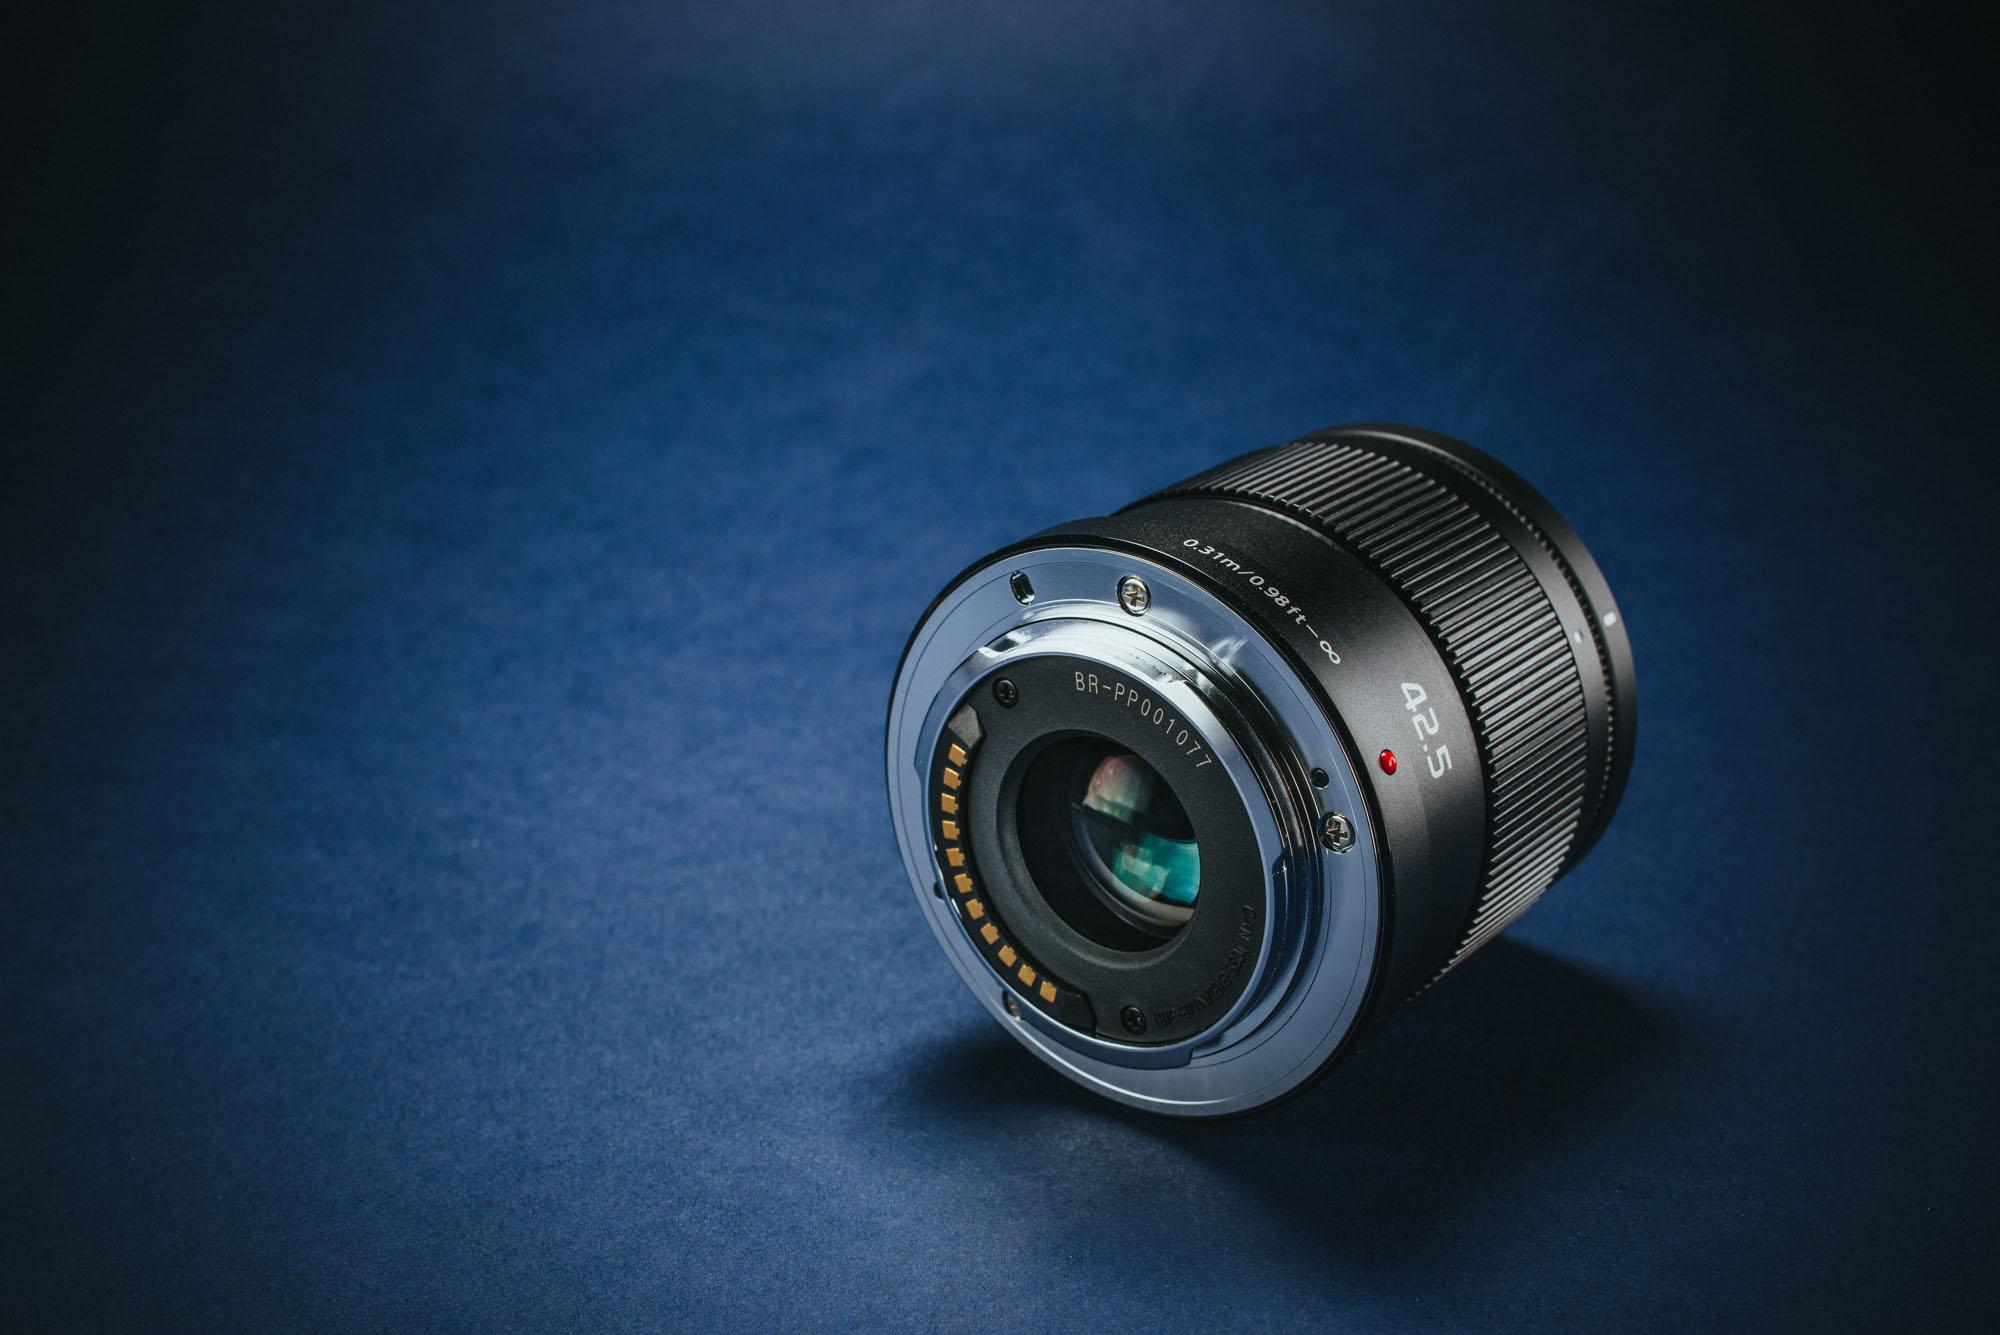 Panasonic_Lumix_42.5mm_f1.7_review_02